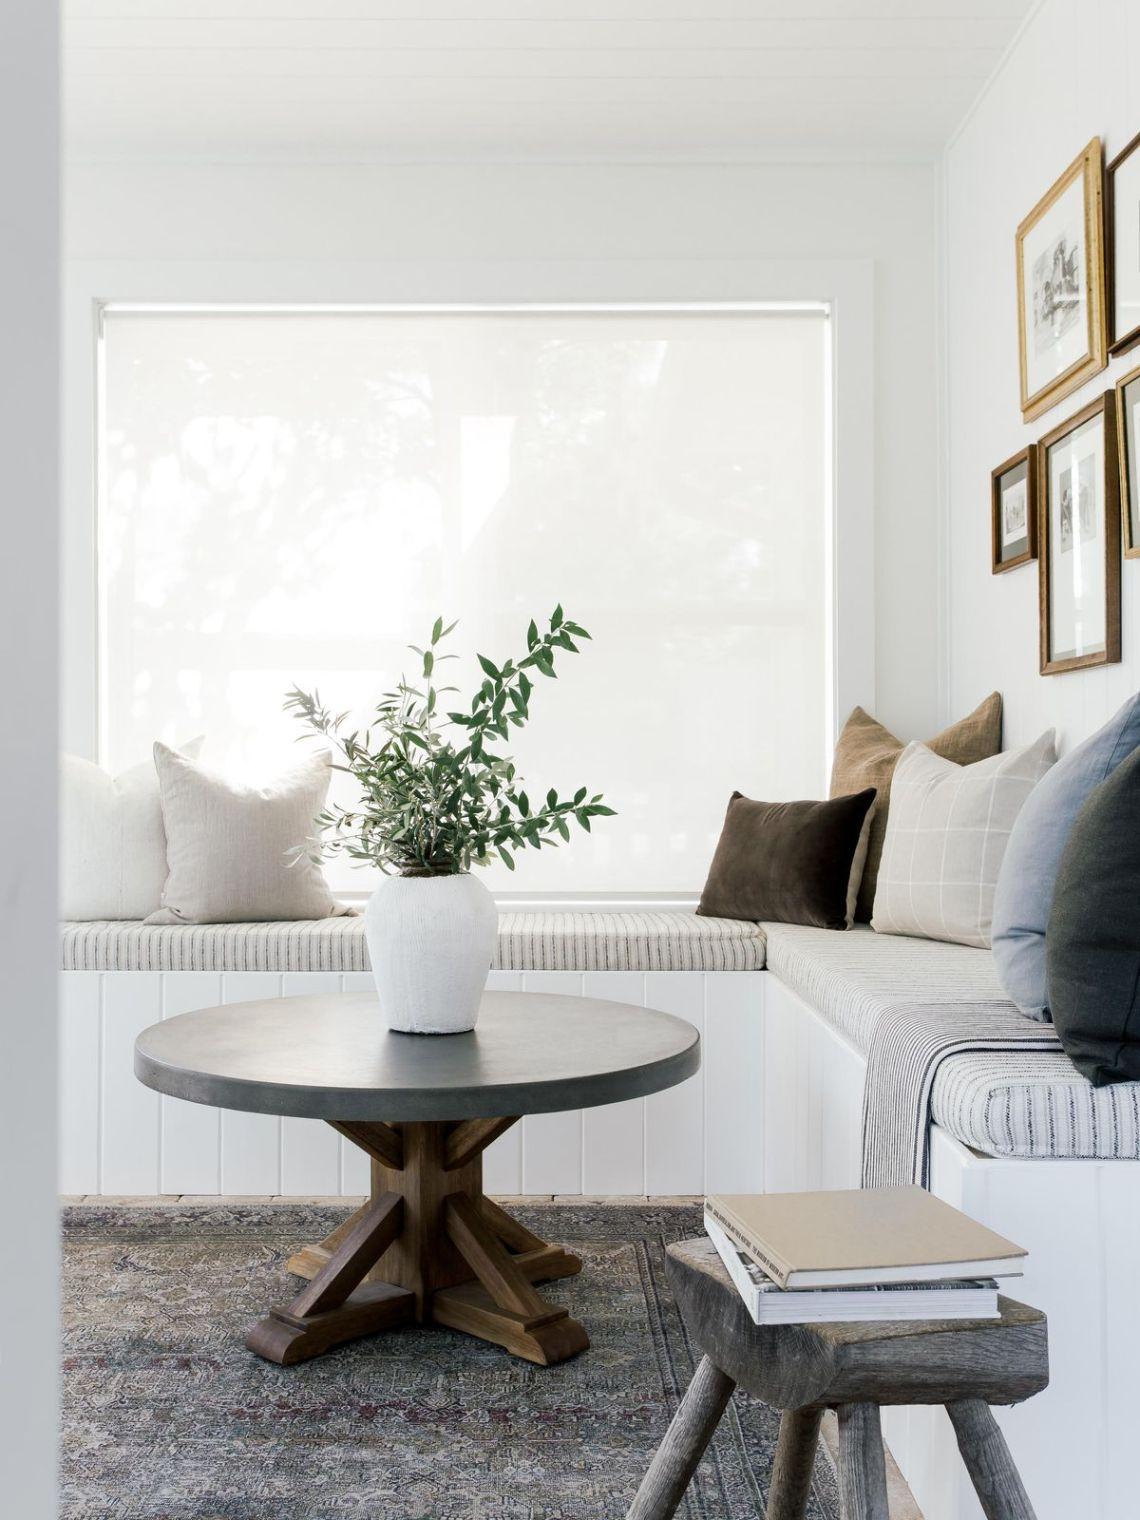 8 Inspiring Sunroom Ideas This Old House